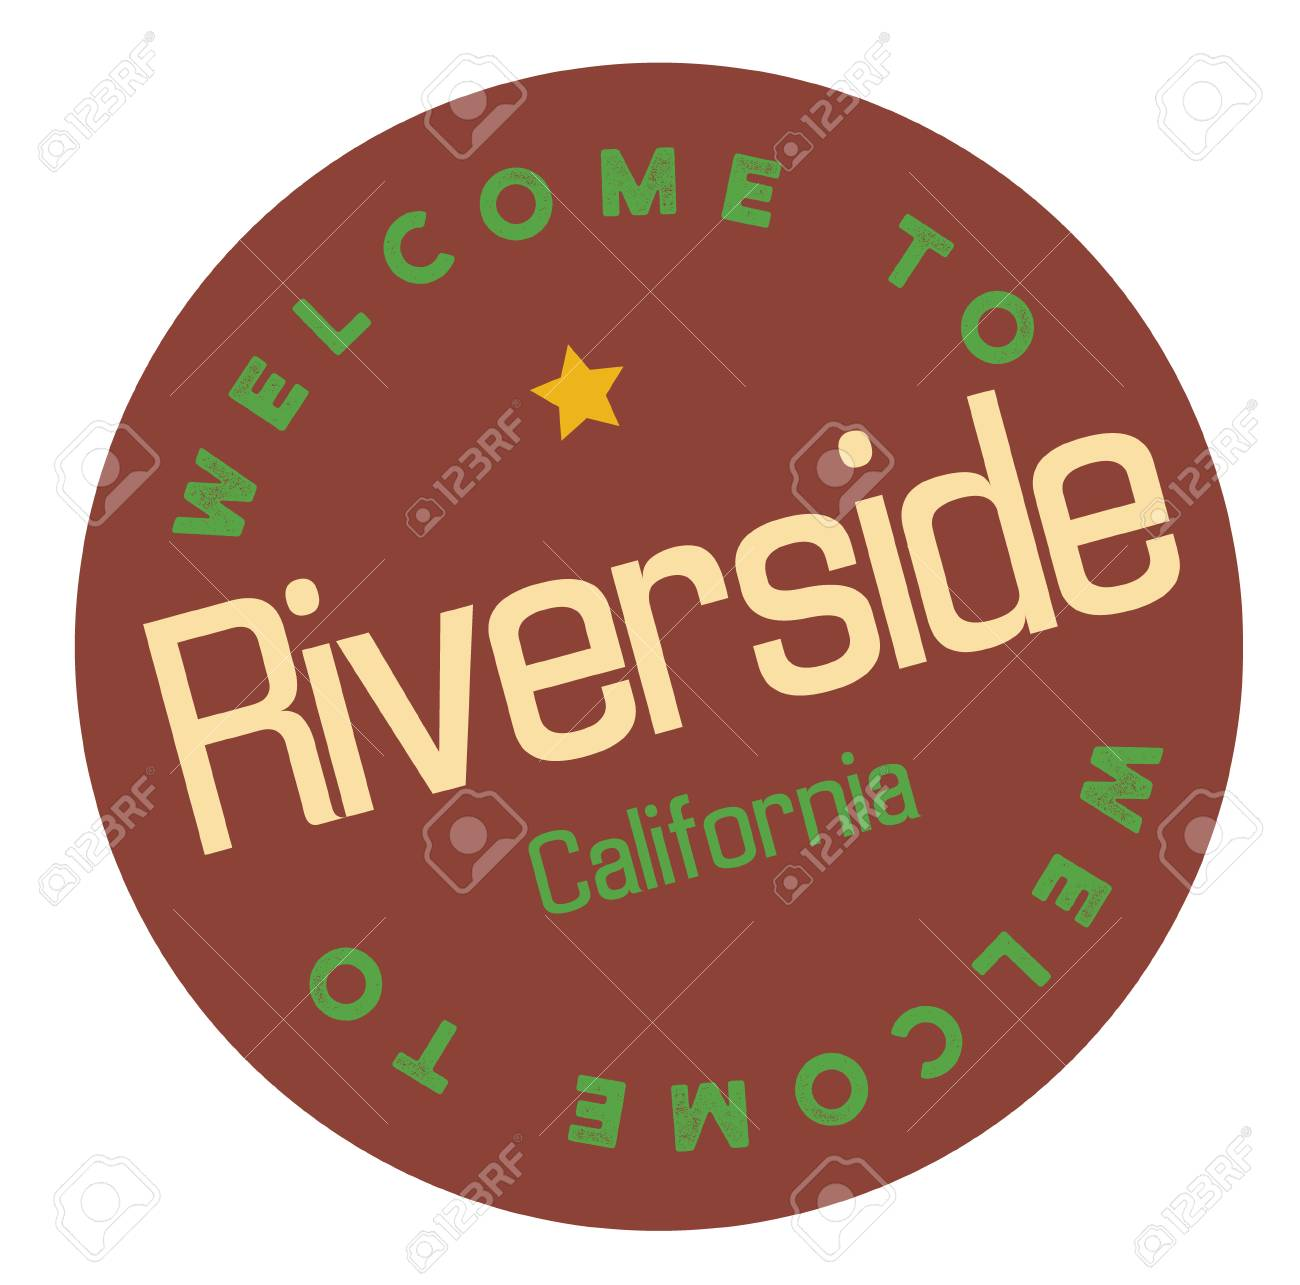 Welcome to Riverside California - 118885329